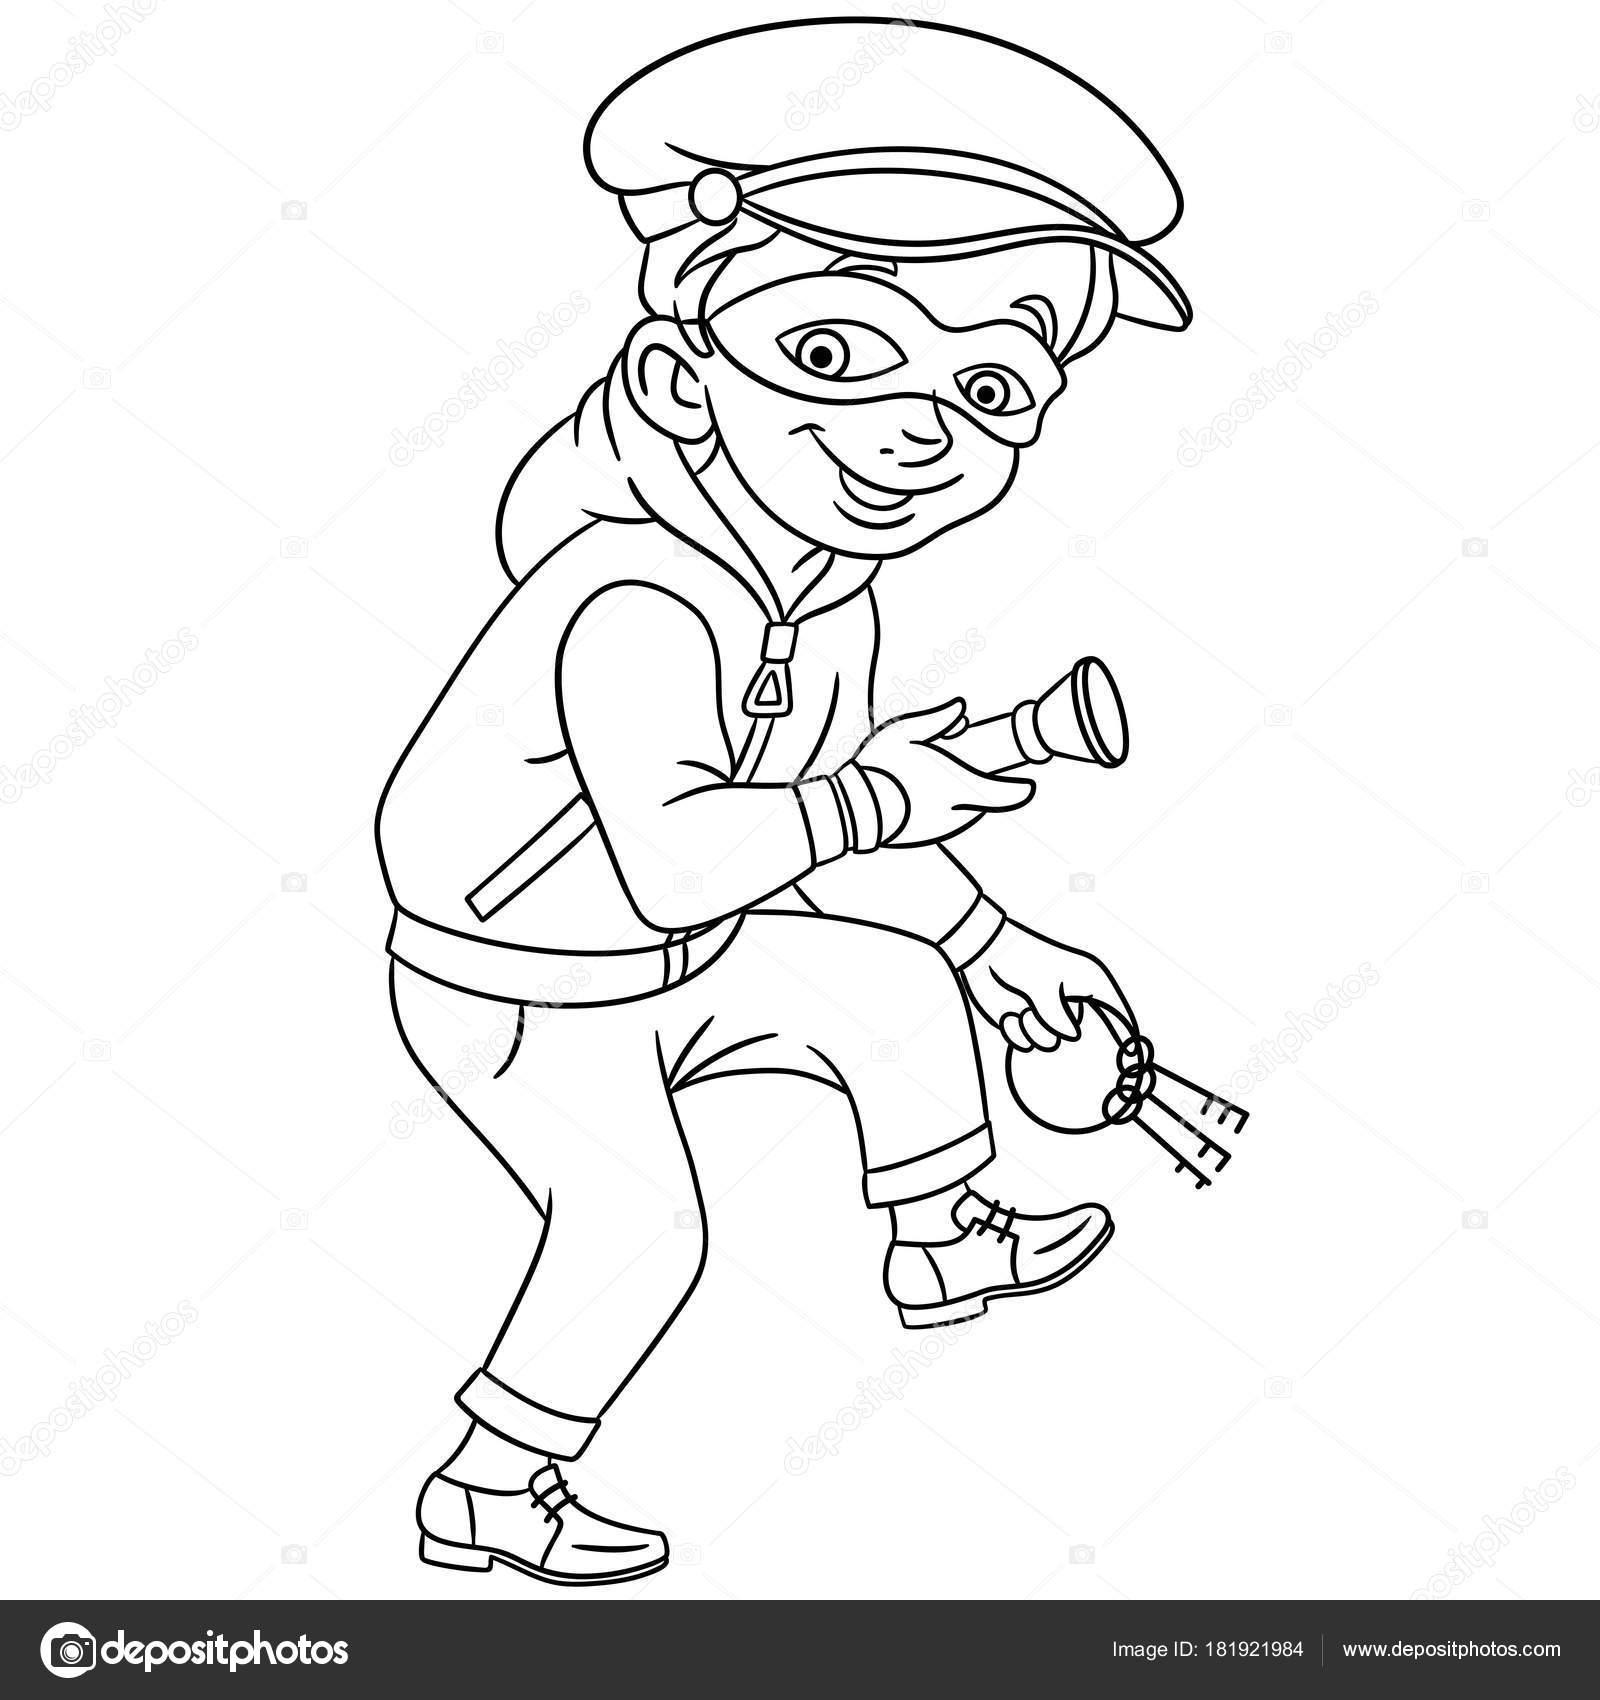 Coloring Page Cartoon Criminal Thief House Bank Keys Flashlight